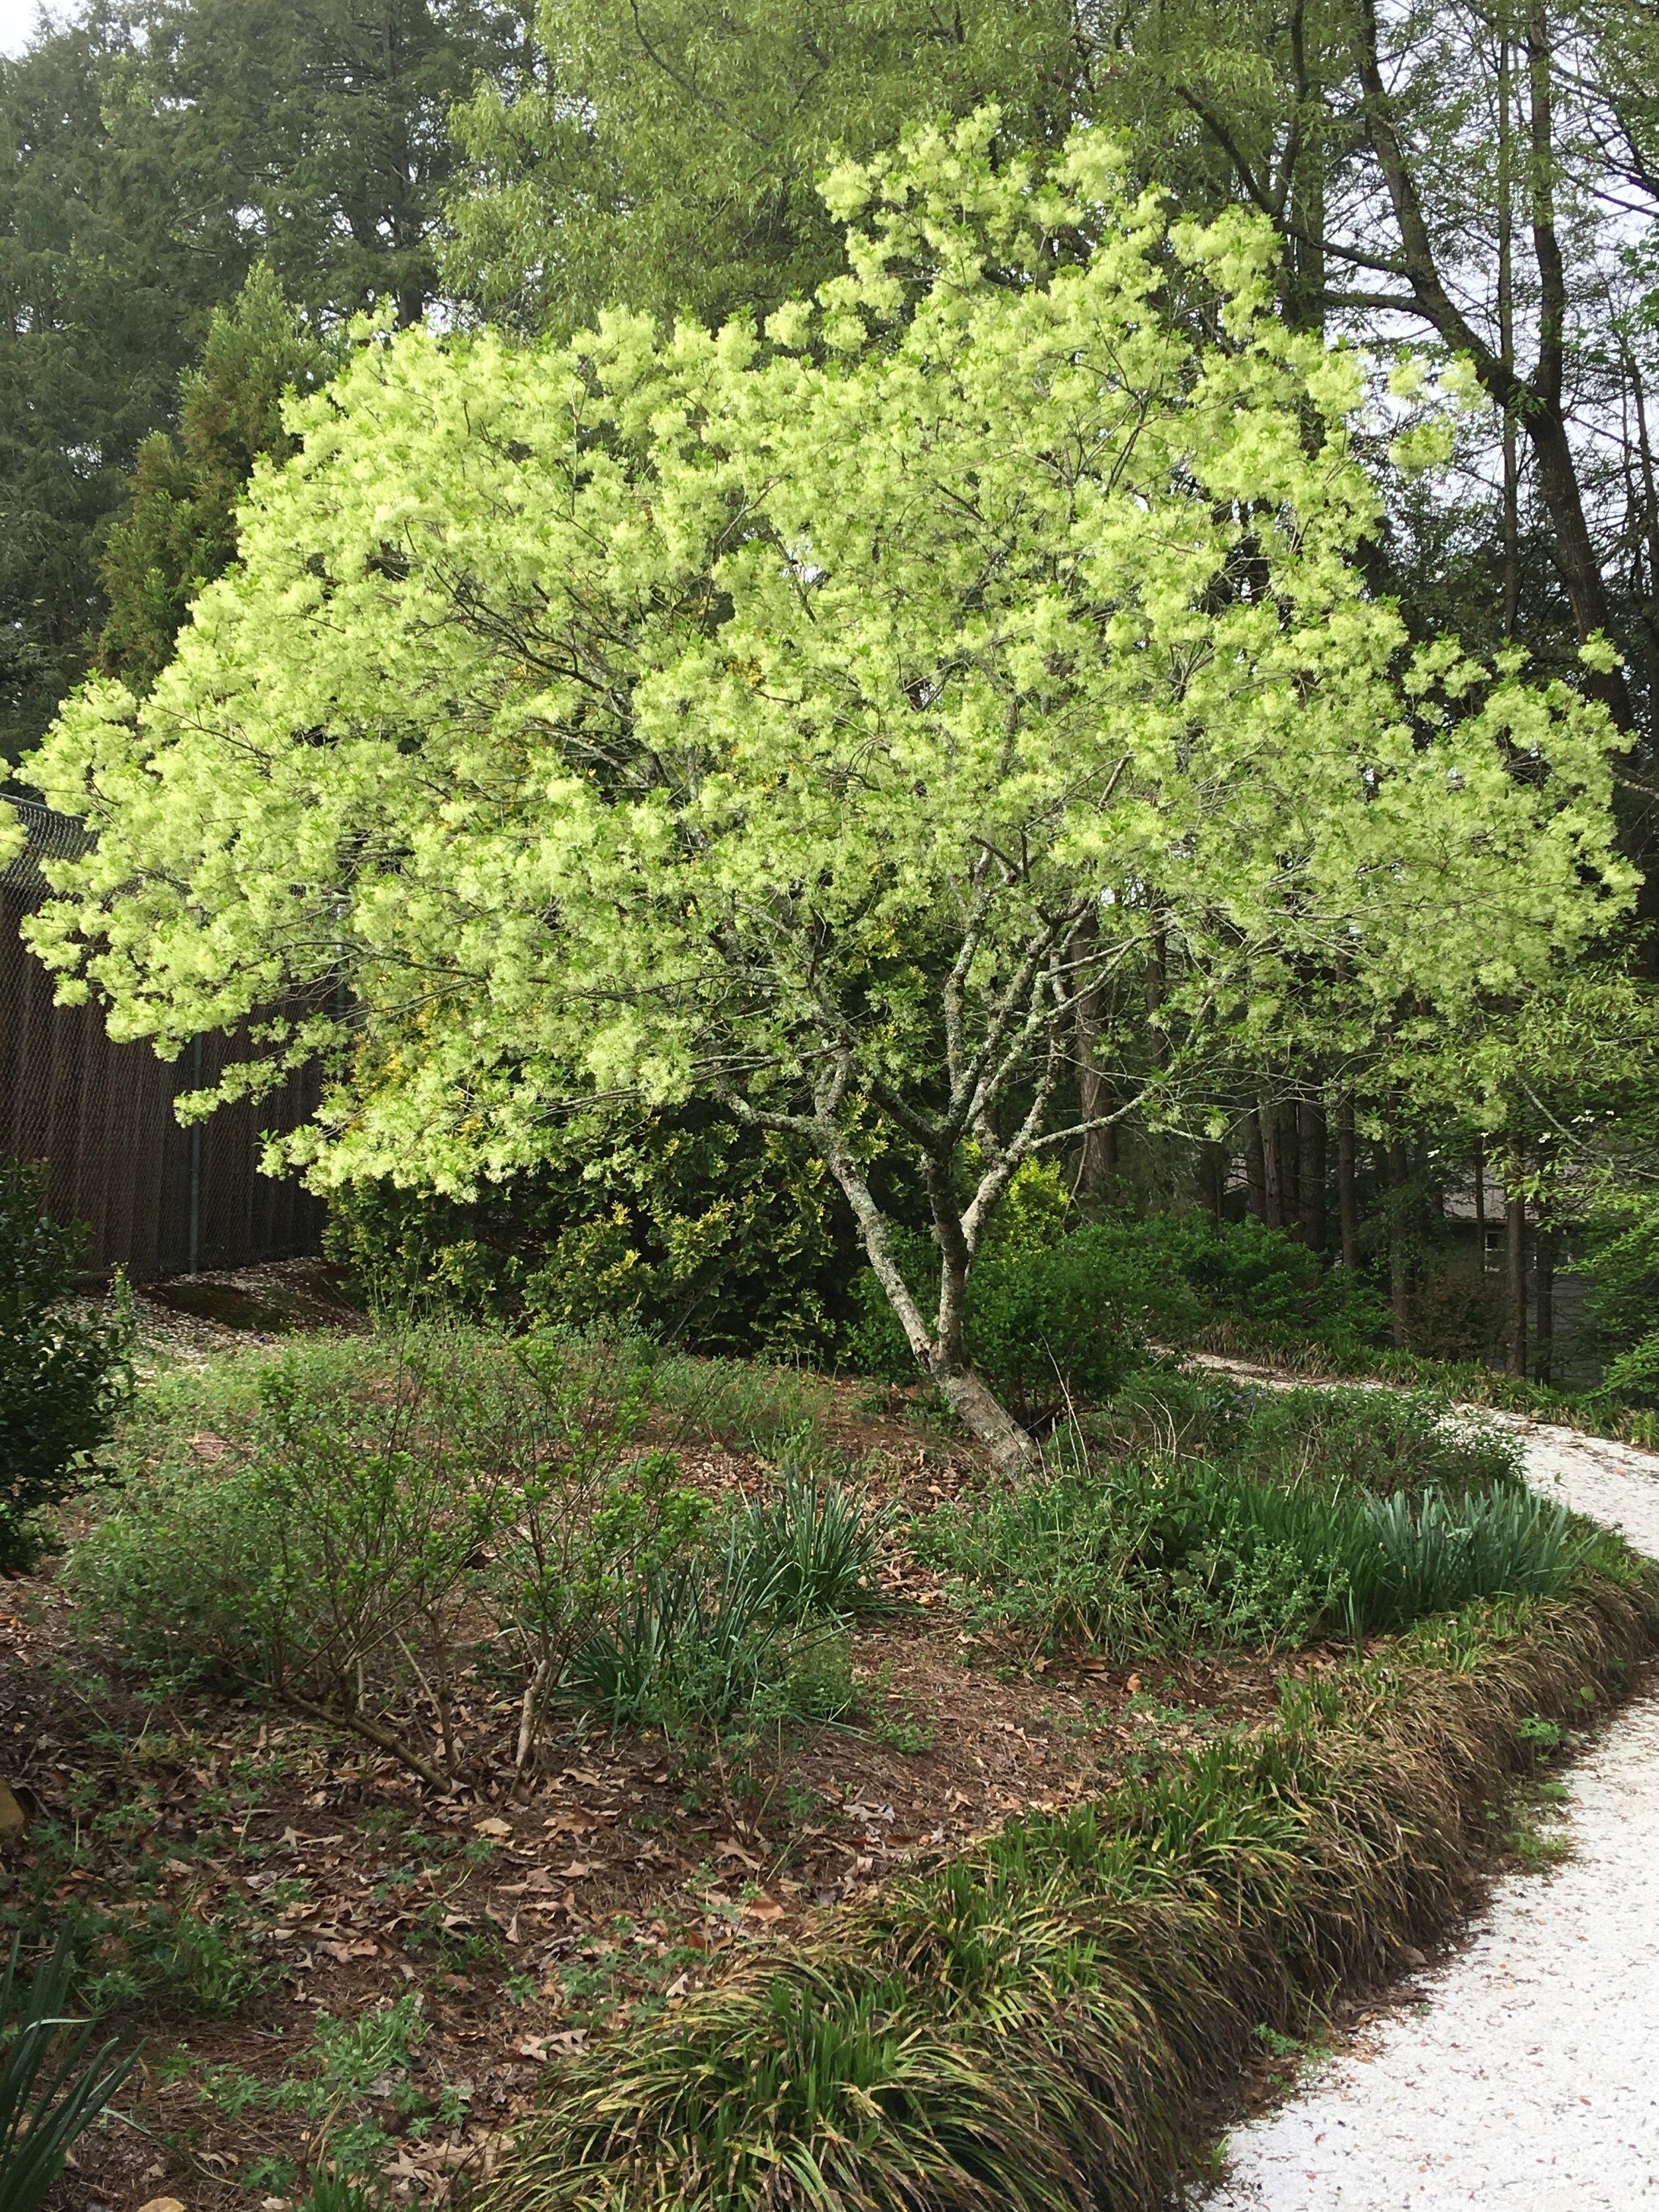 Chionanthus virginicus; White fringe tree